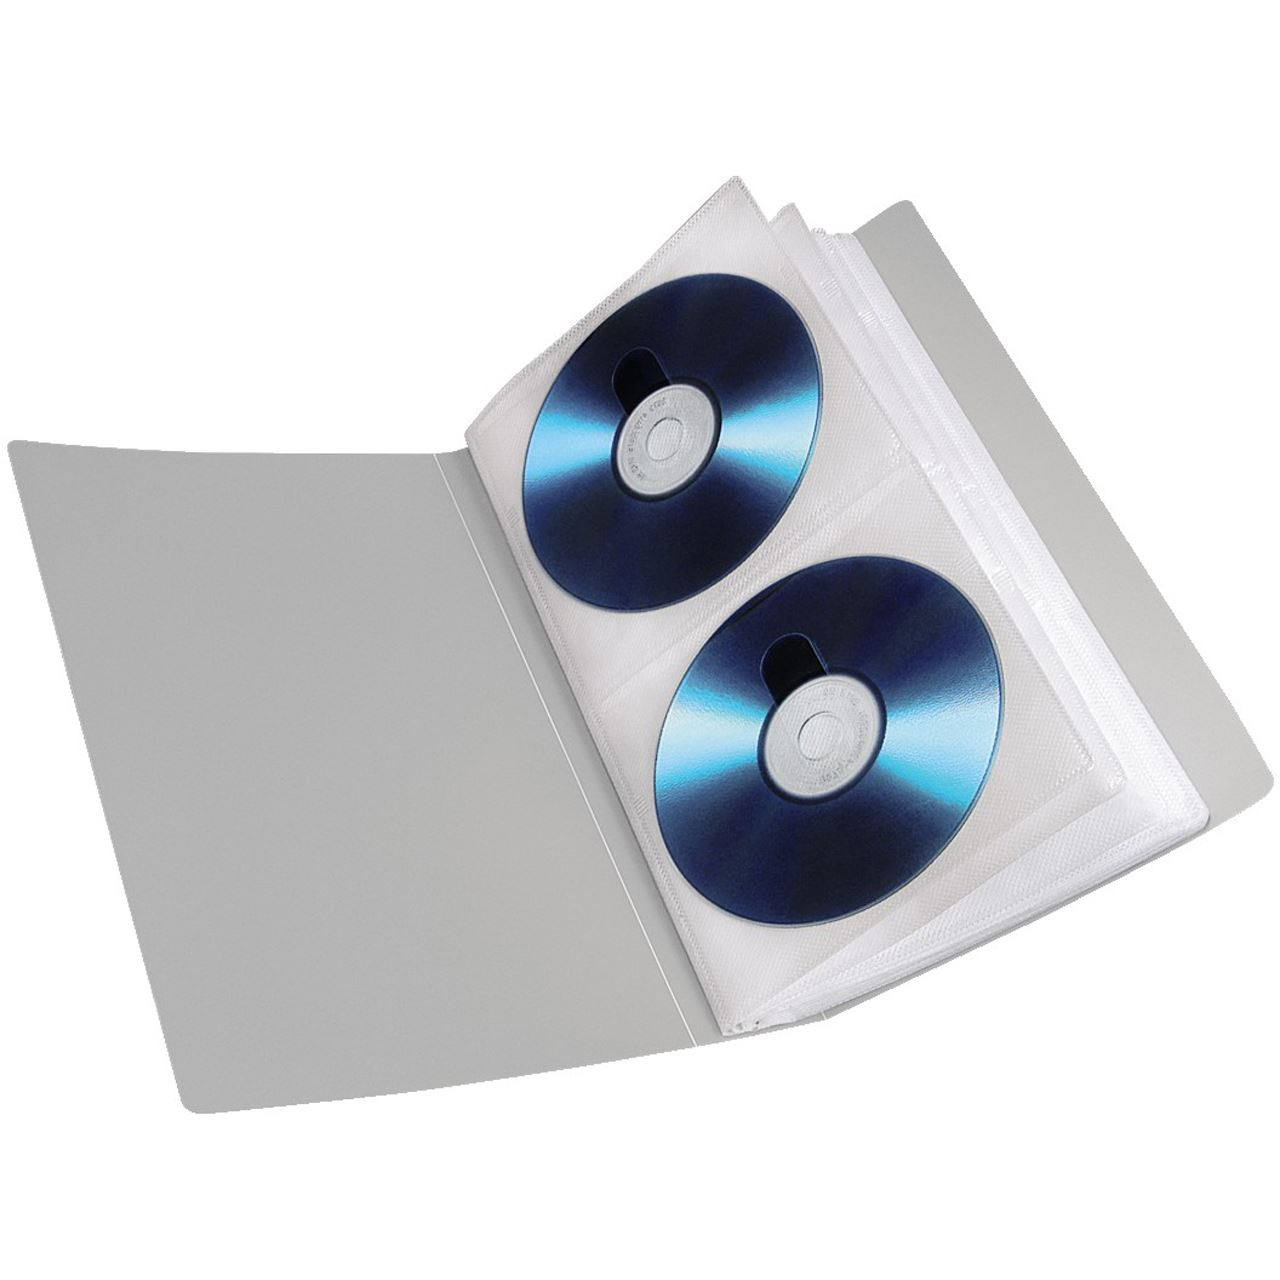 hama 48er silberne cd dvd rom mappe f r aufbewahrung. Black Bedroom Furniture Sets. Home Design Ideas